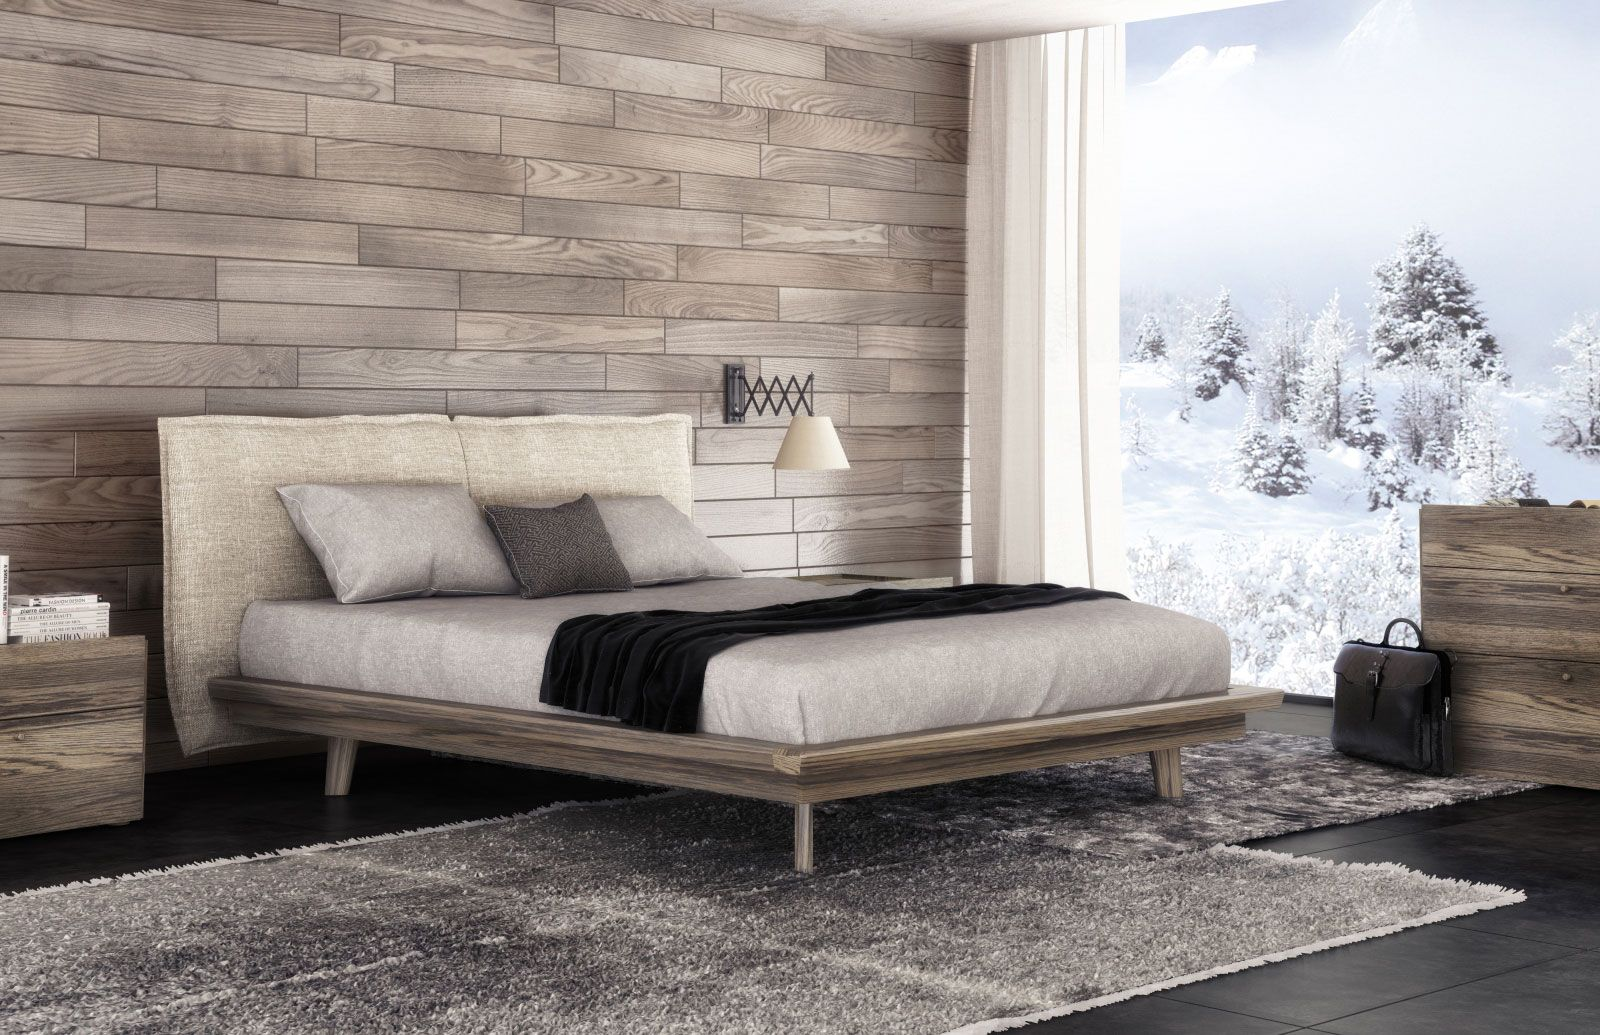 Superior Collection Motionhuppe Furniture. Modern Walnut Finish